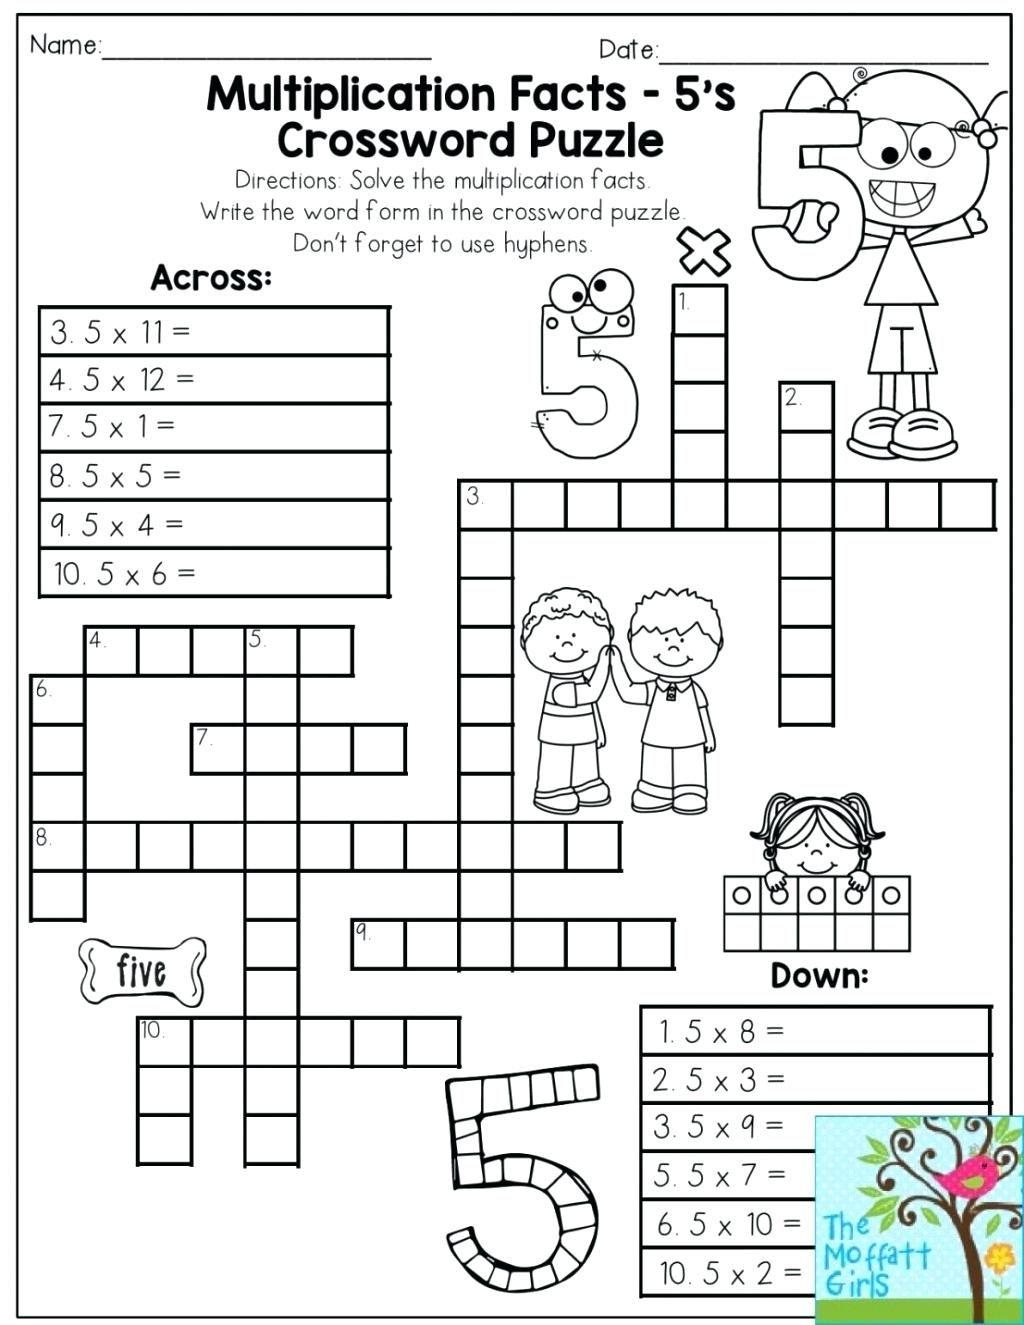 Printable Math Puzzles 5Th Grade Maths Ksheets Middle School Pdf Fun - Printable Puzzles Ks3